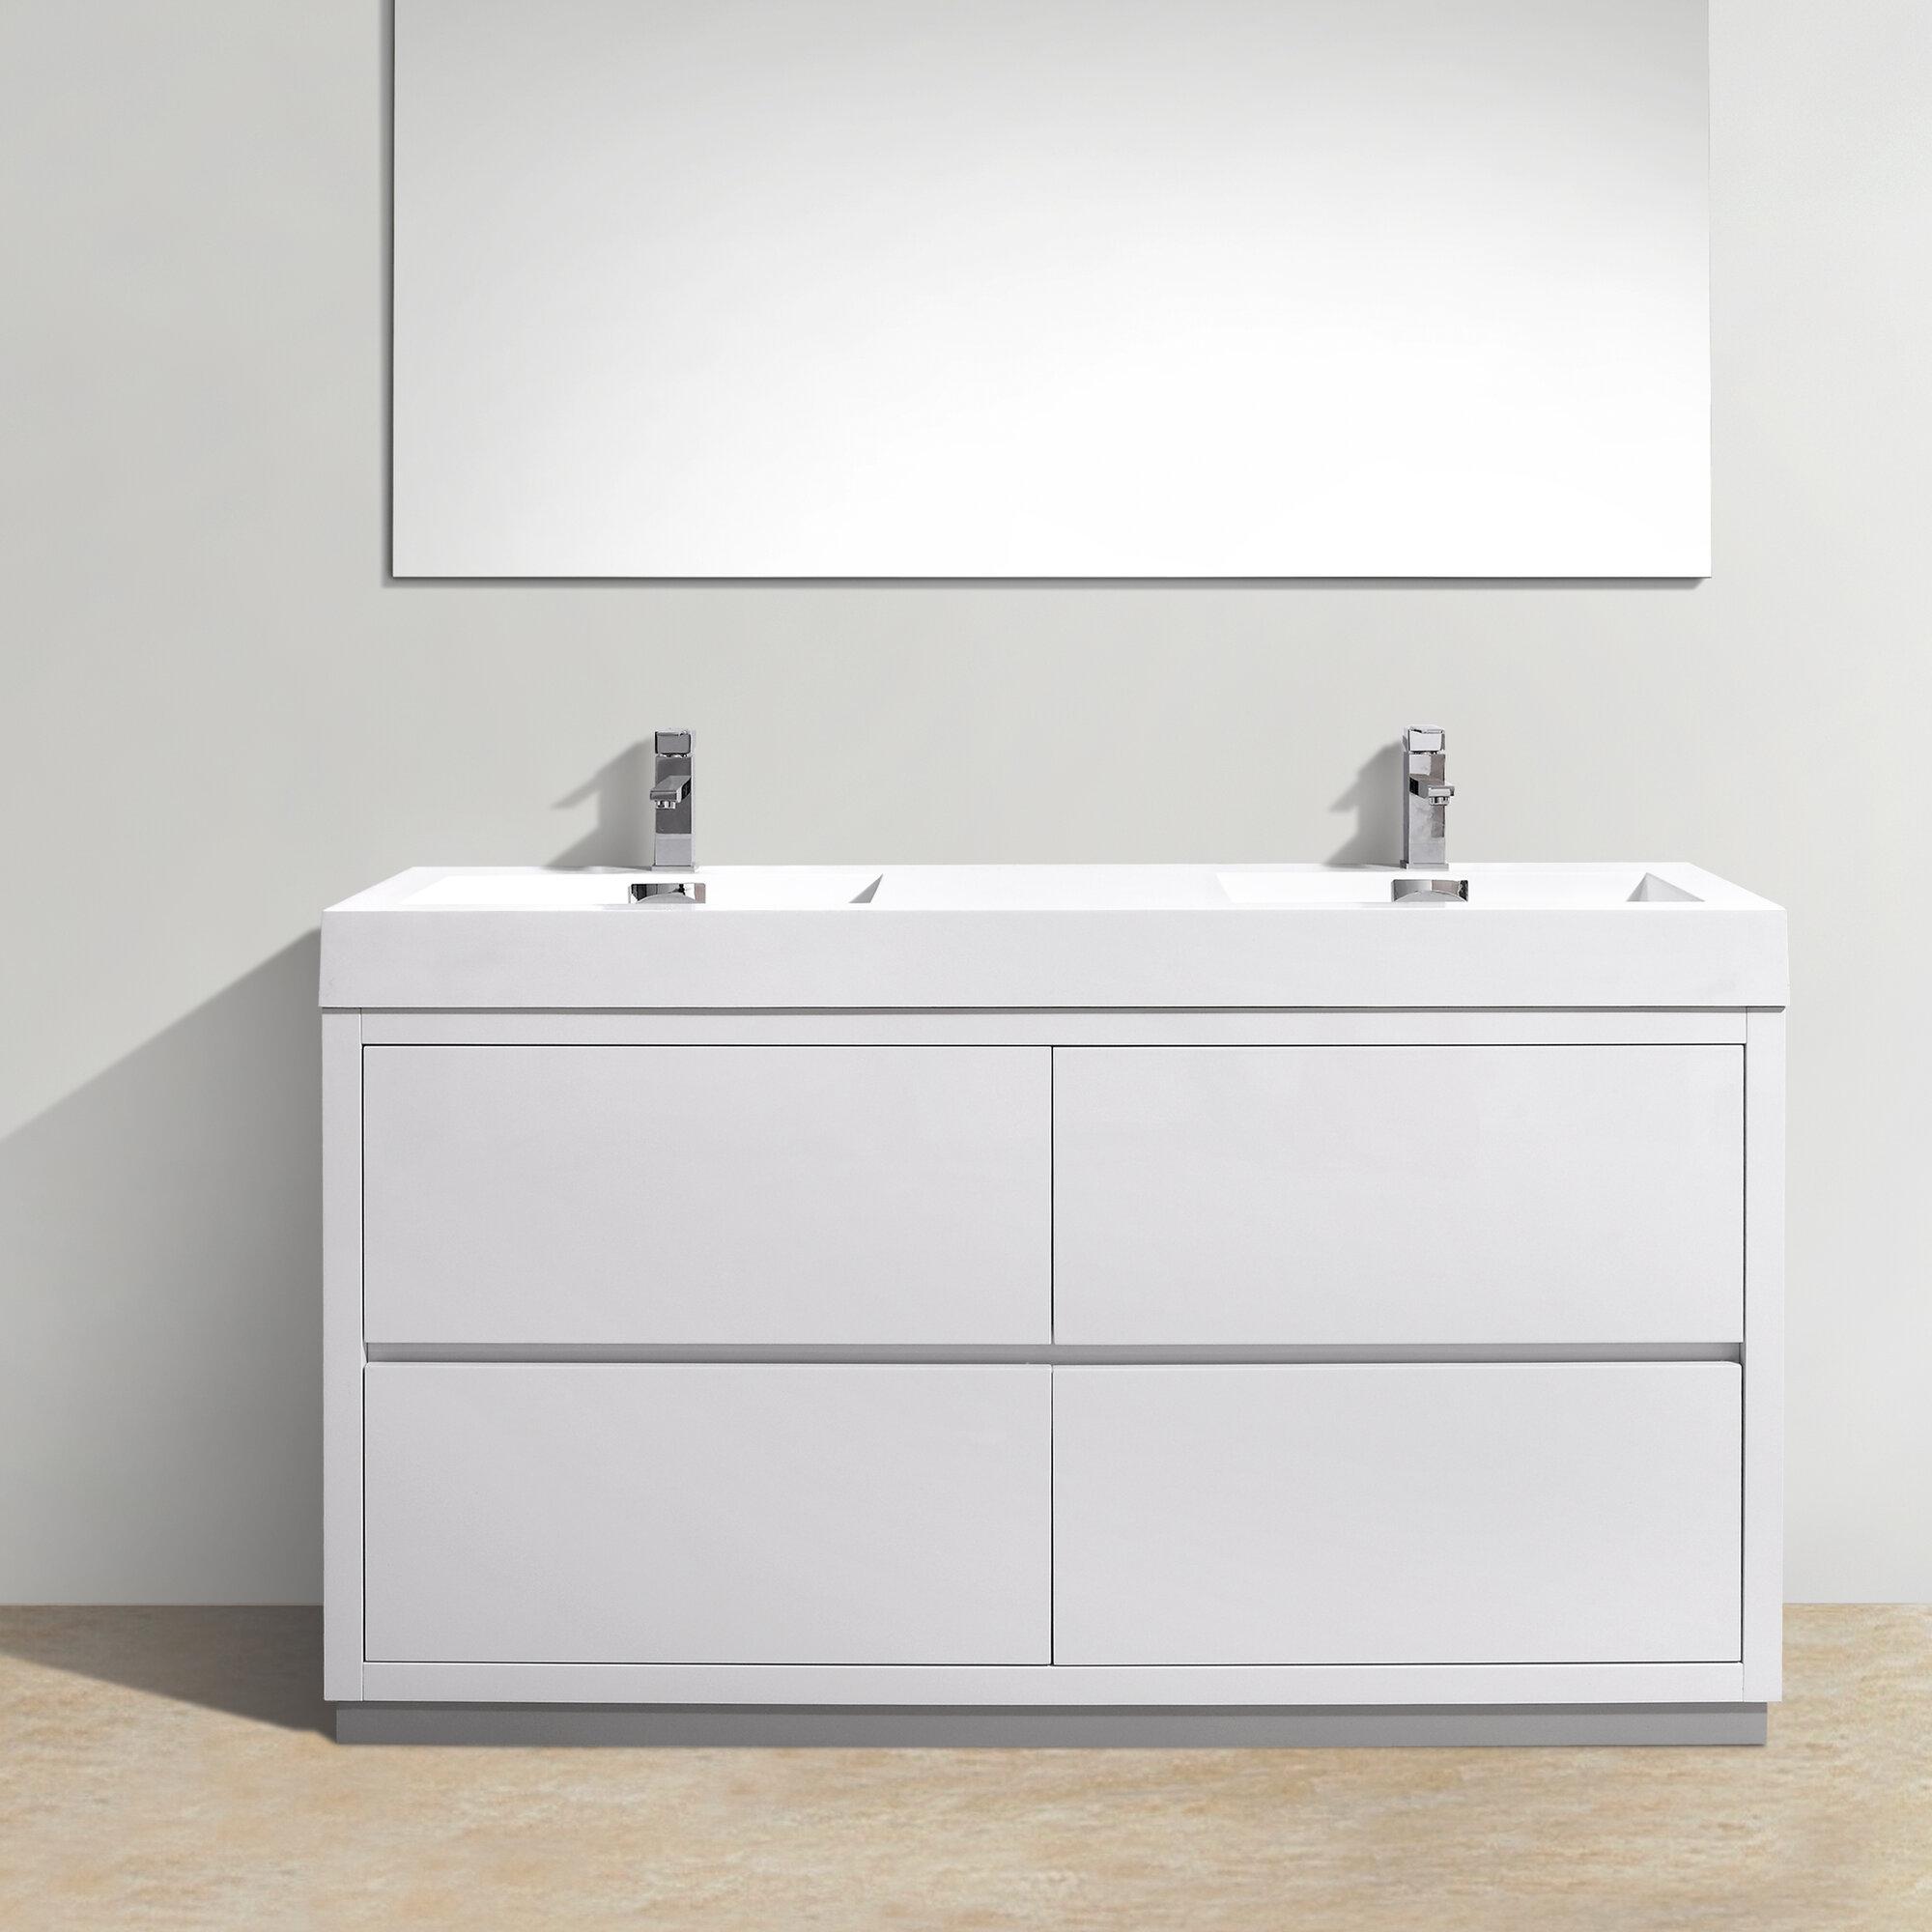 Kube bath bliss 60 double free standing modern bathroom vanity set ebay for Free standing bathroom vanities